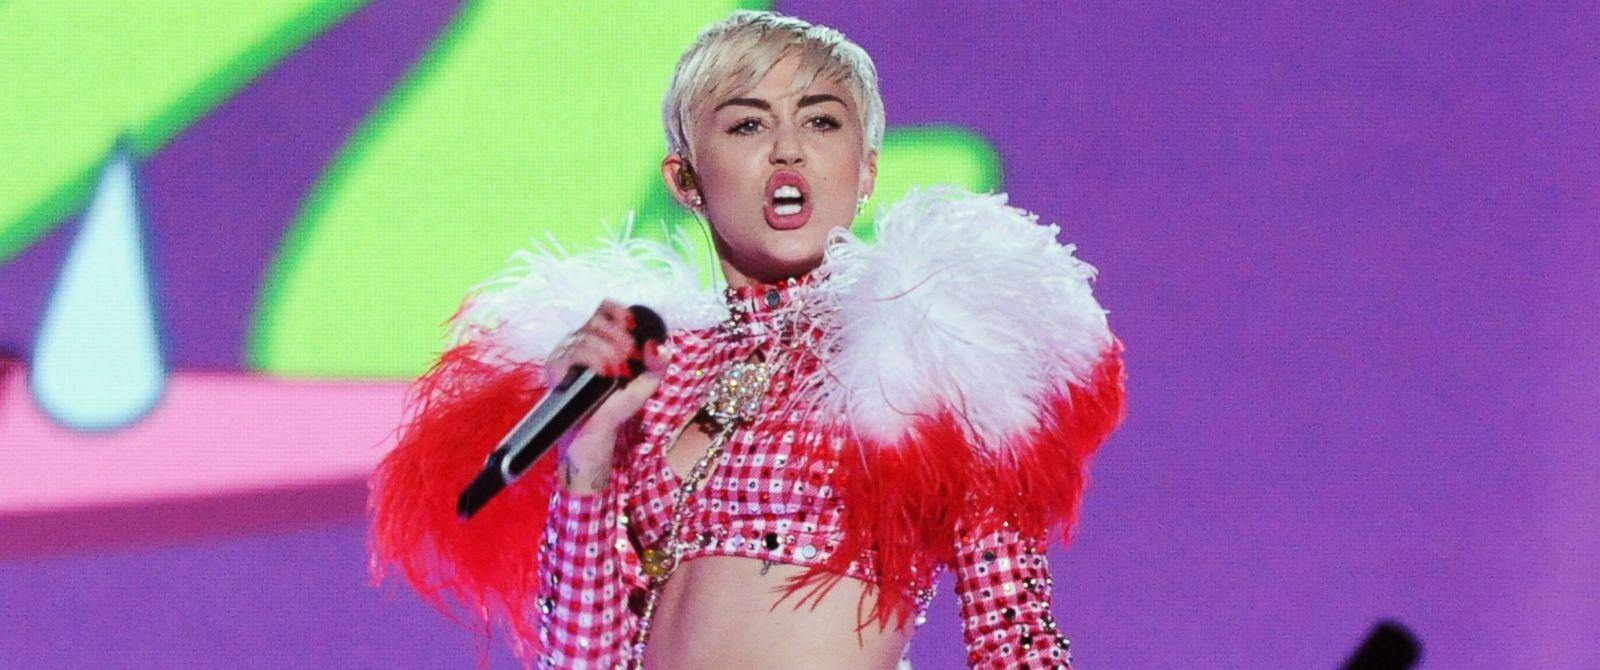 PHOTO: Miley Cyrus performs on March 25, 2014 in Atlanta, Georgia.